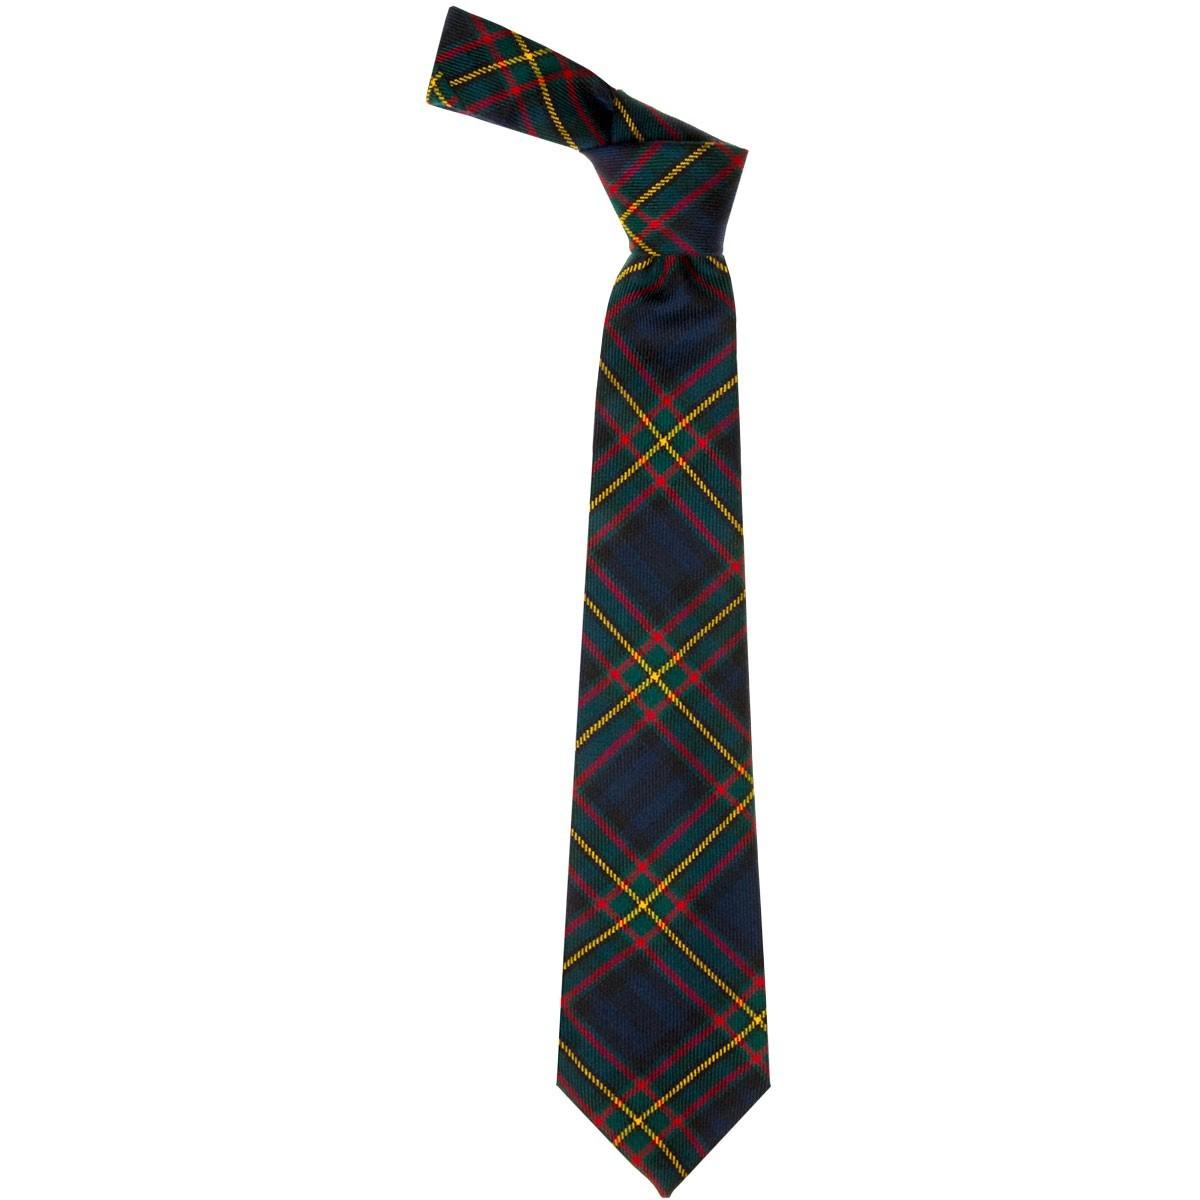 Mens Bow Tie Woven in Scotland Scottish National Tartan